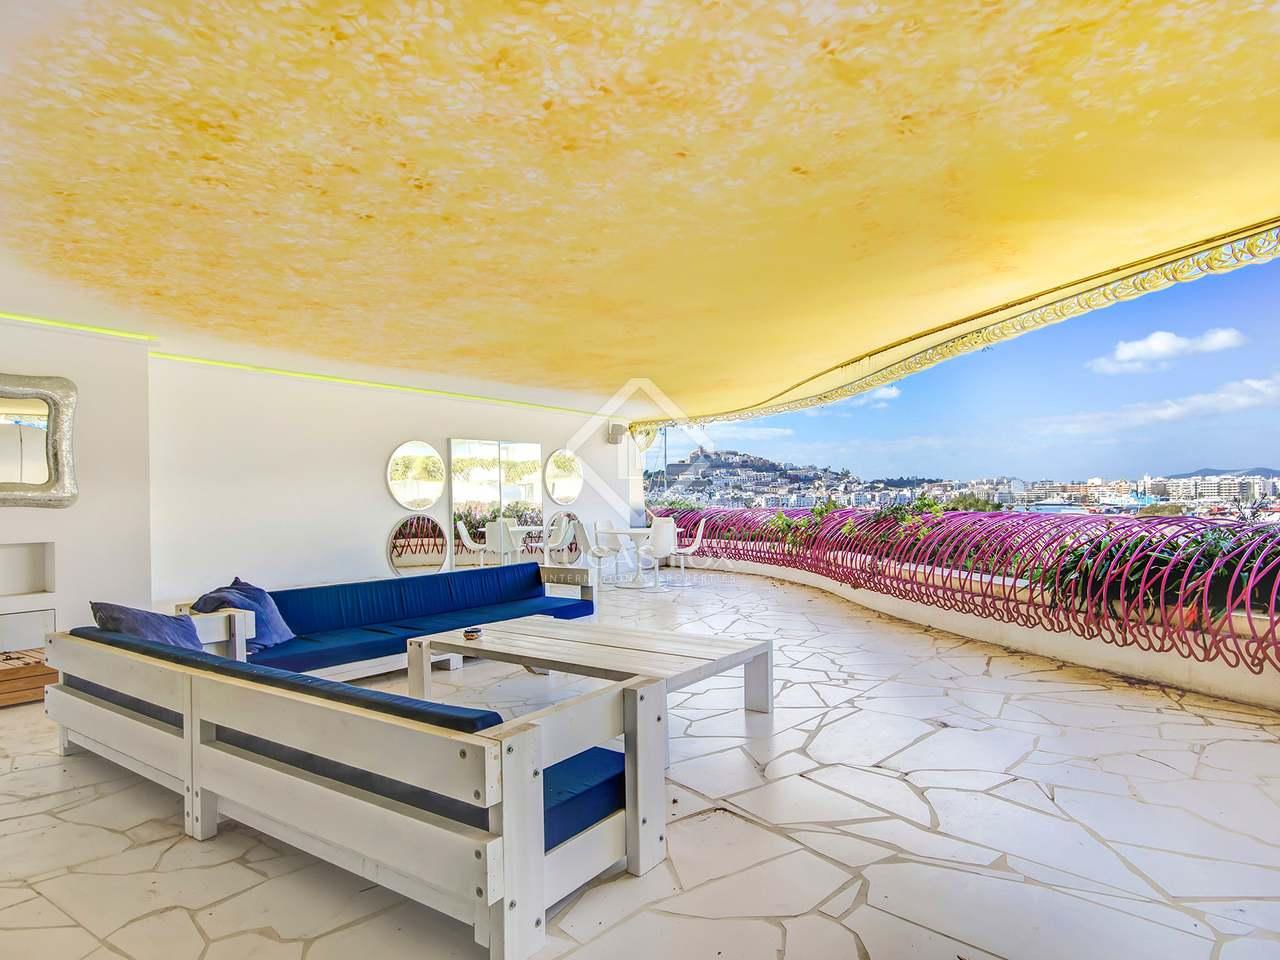 3 Bedroom Apartment For Sale In Marina Botafoch Ibiza